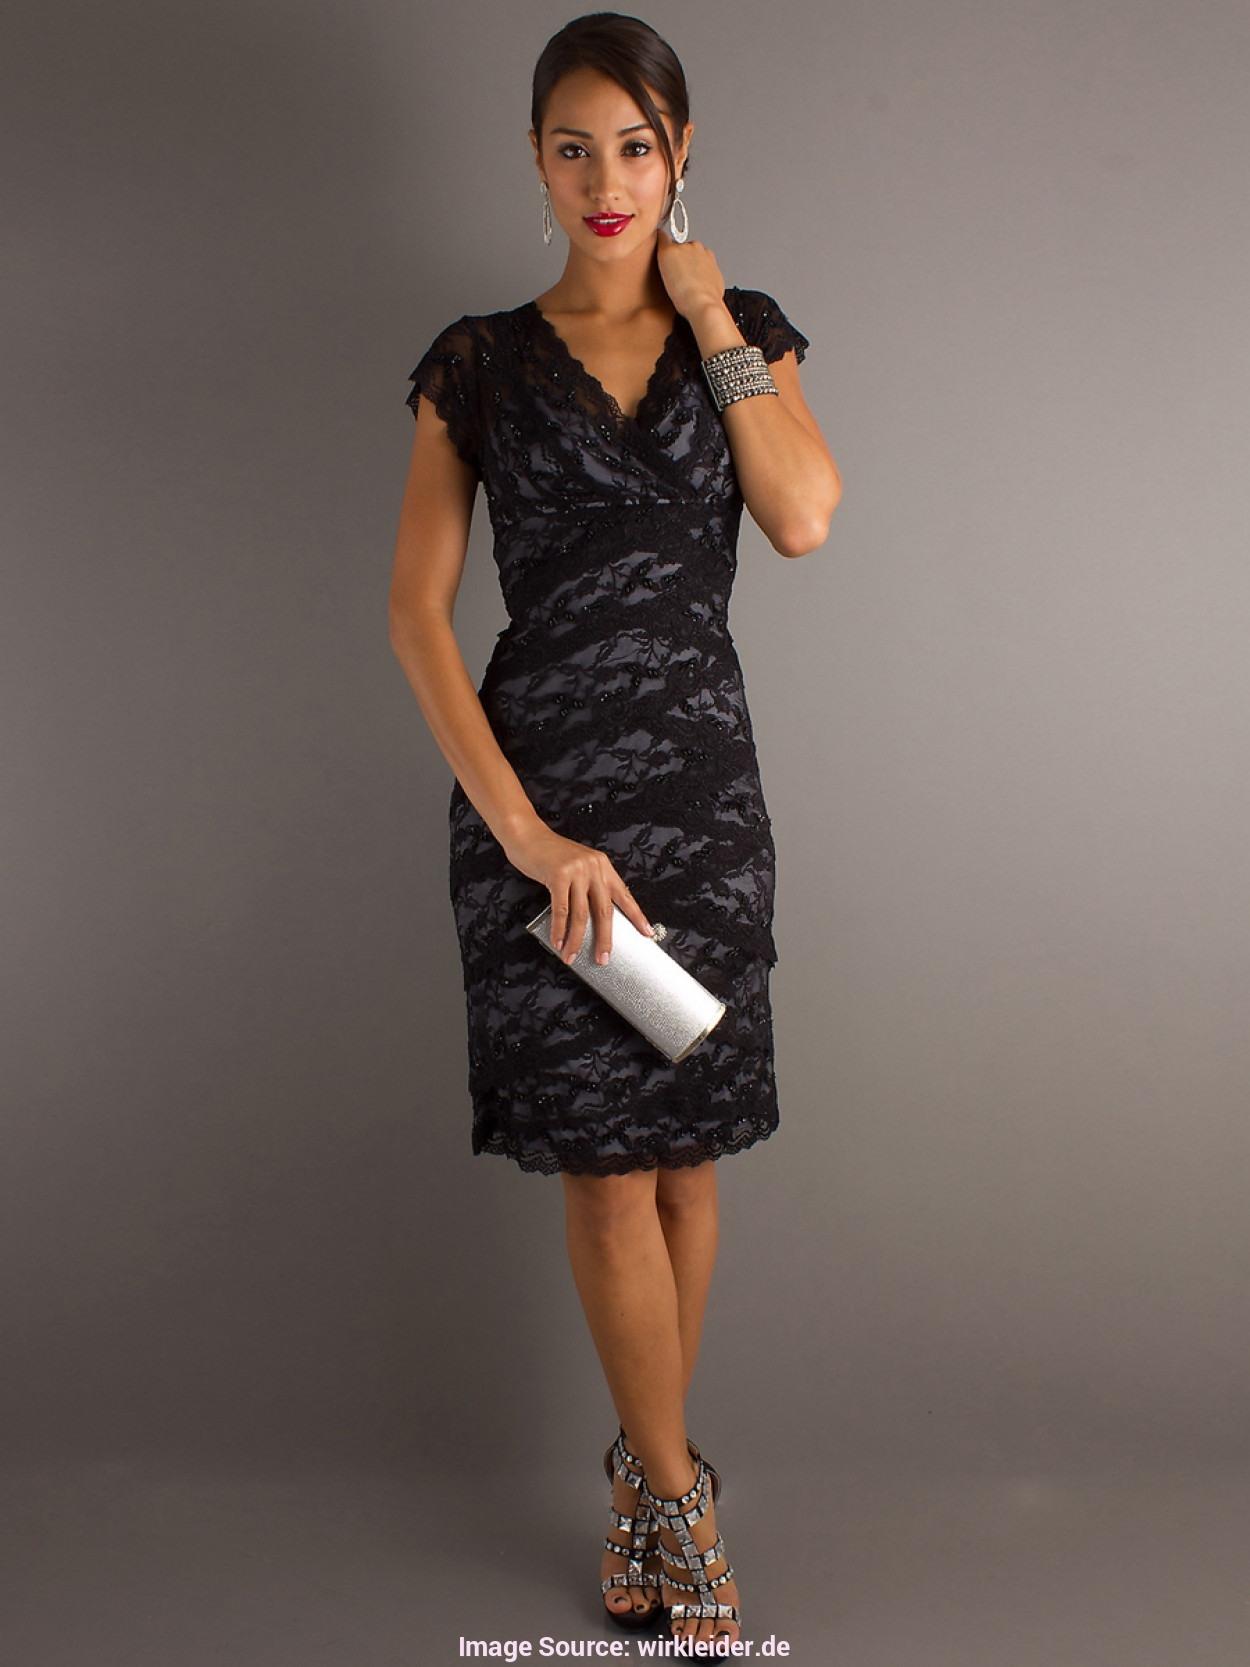 Formal Perfekt Festliches Kleid Knielang Galerie Ausgezeichnet Festliches Kleid Knielang Design